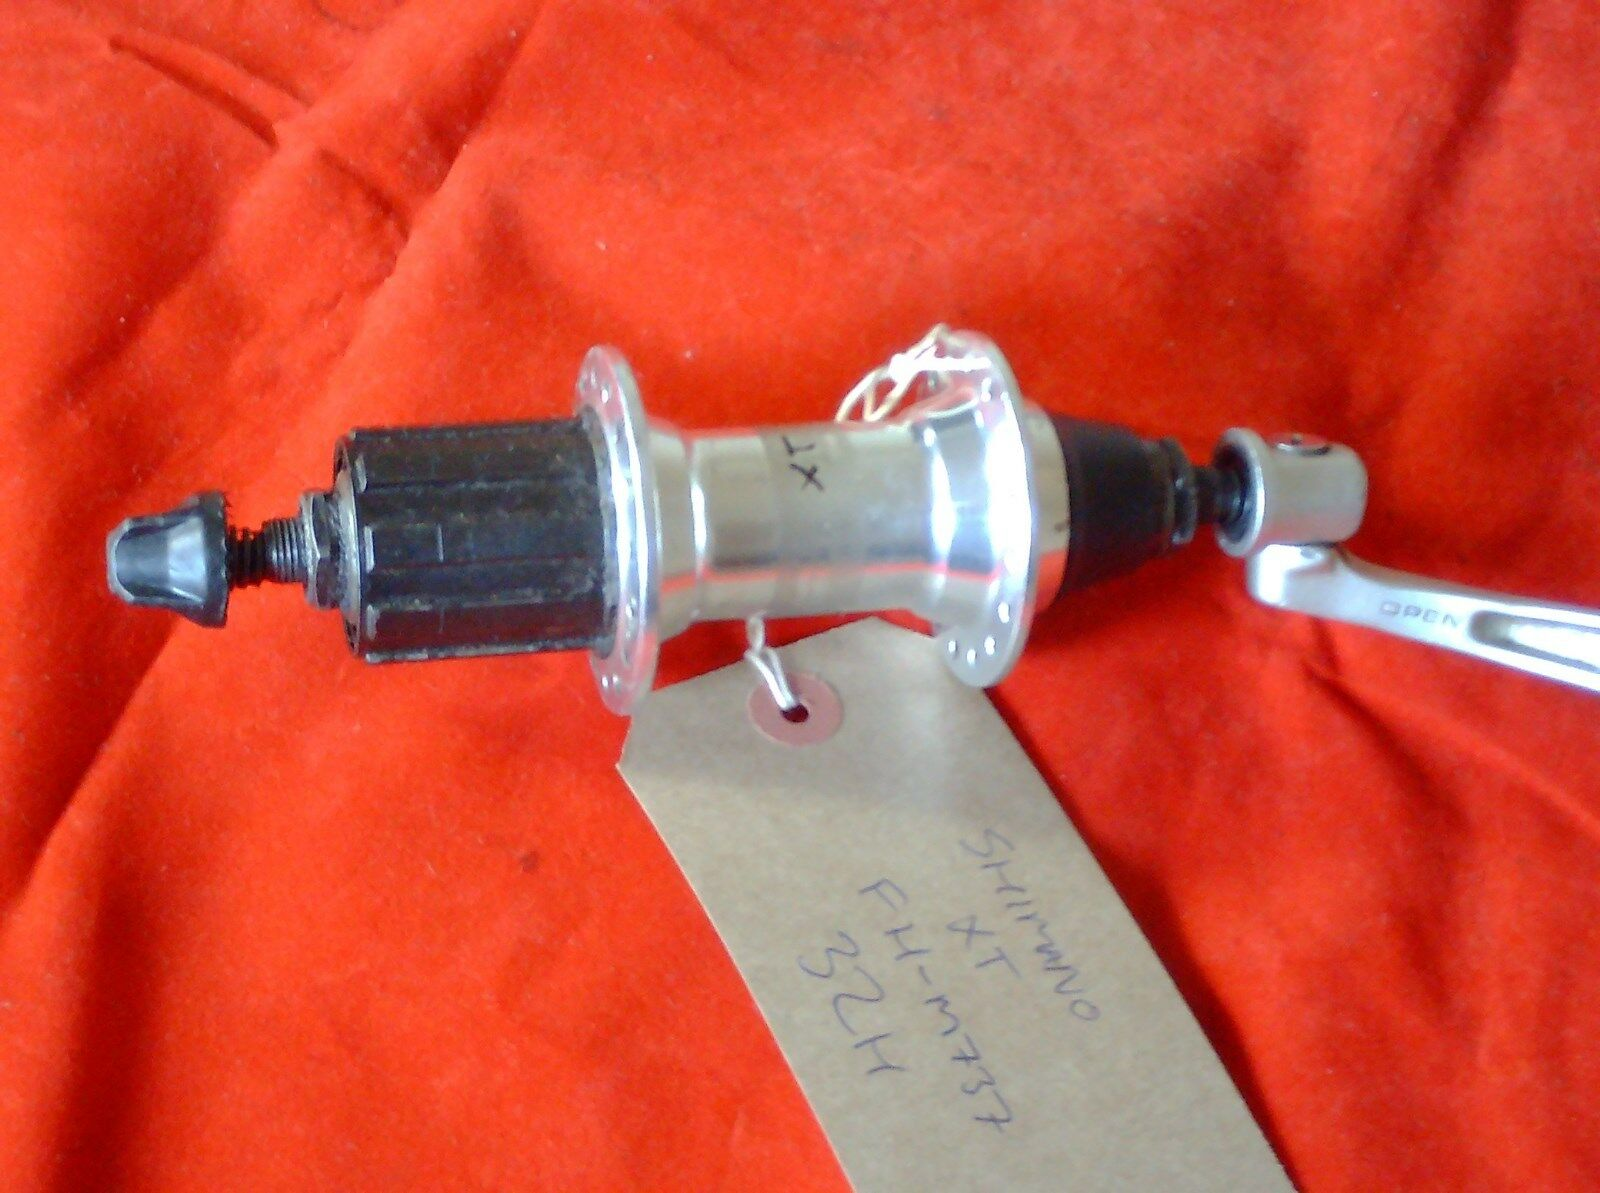 SHIMANO  FH-M737 XT  32 HOLE 8 9 SPEED  CASSETTE HUB 135mm, 1997